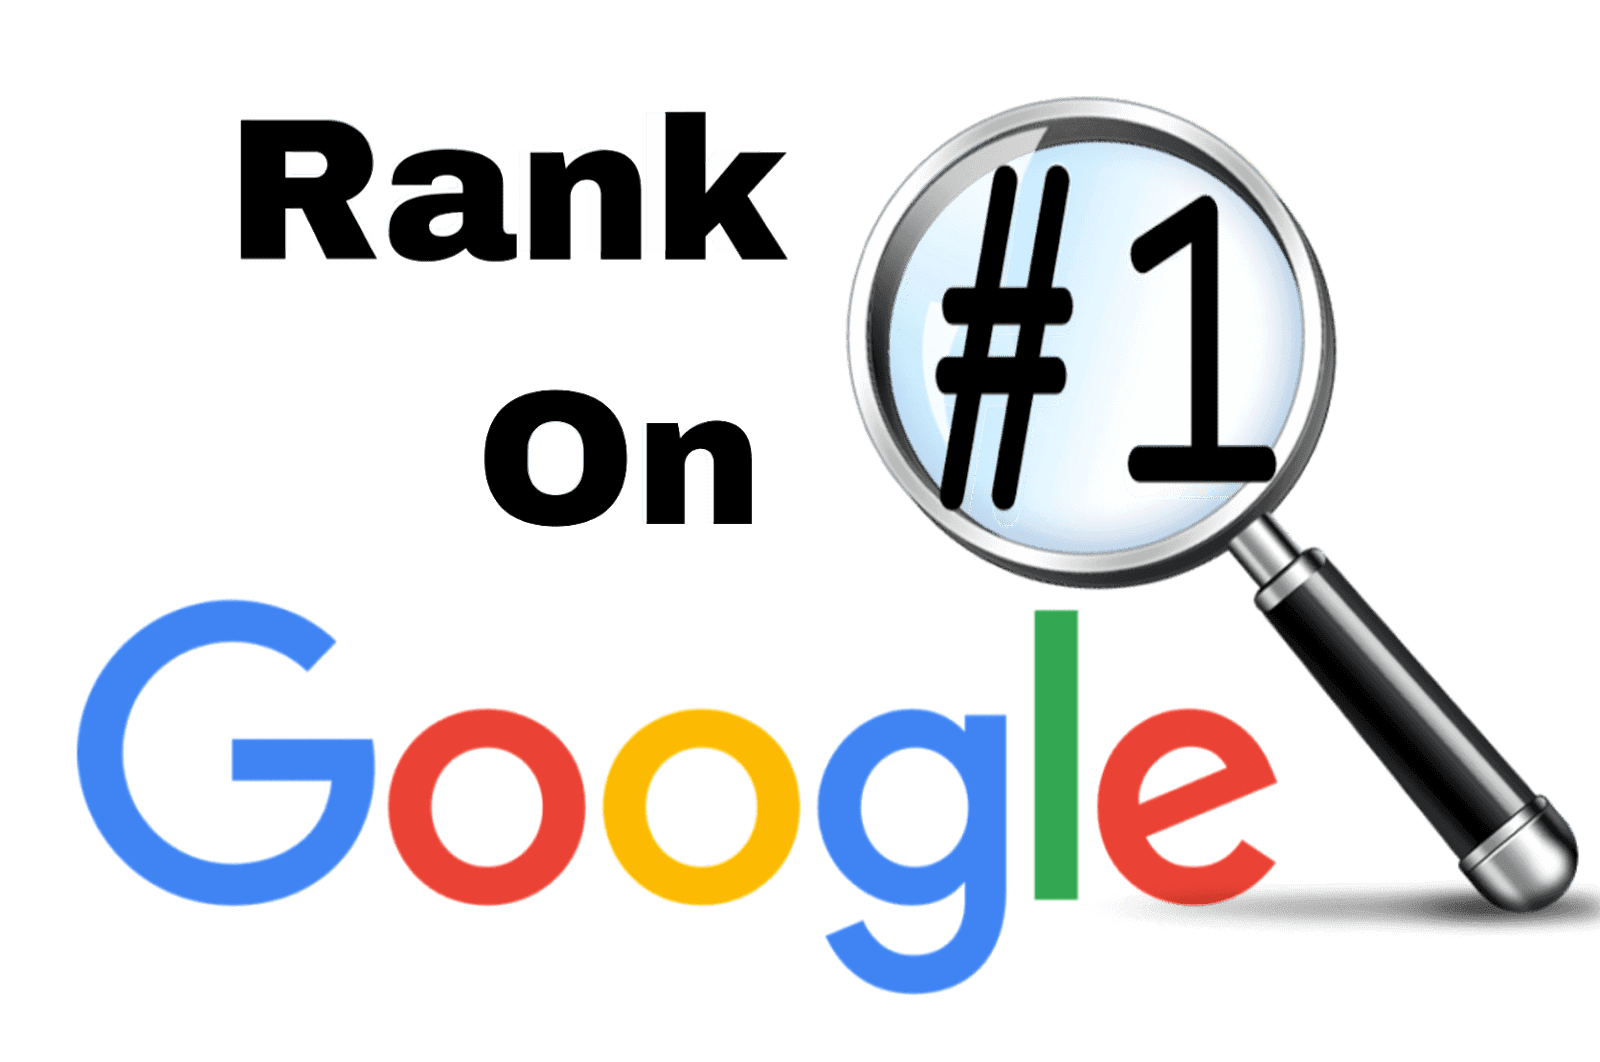 1-on-Google